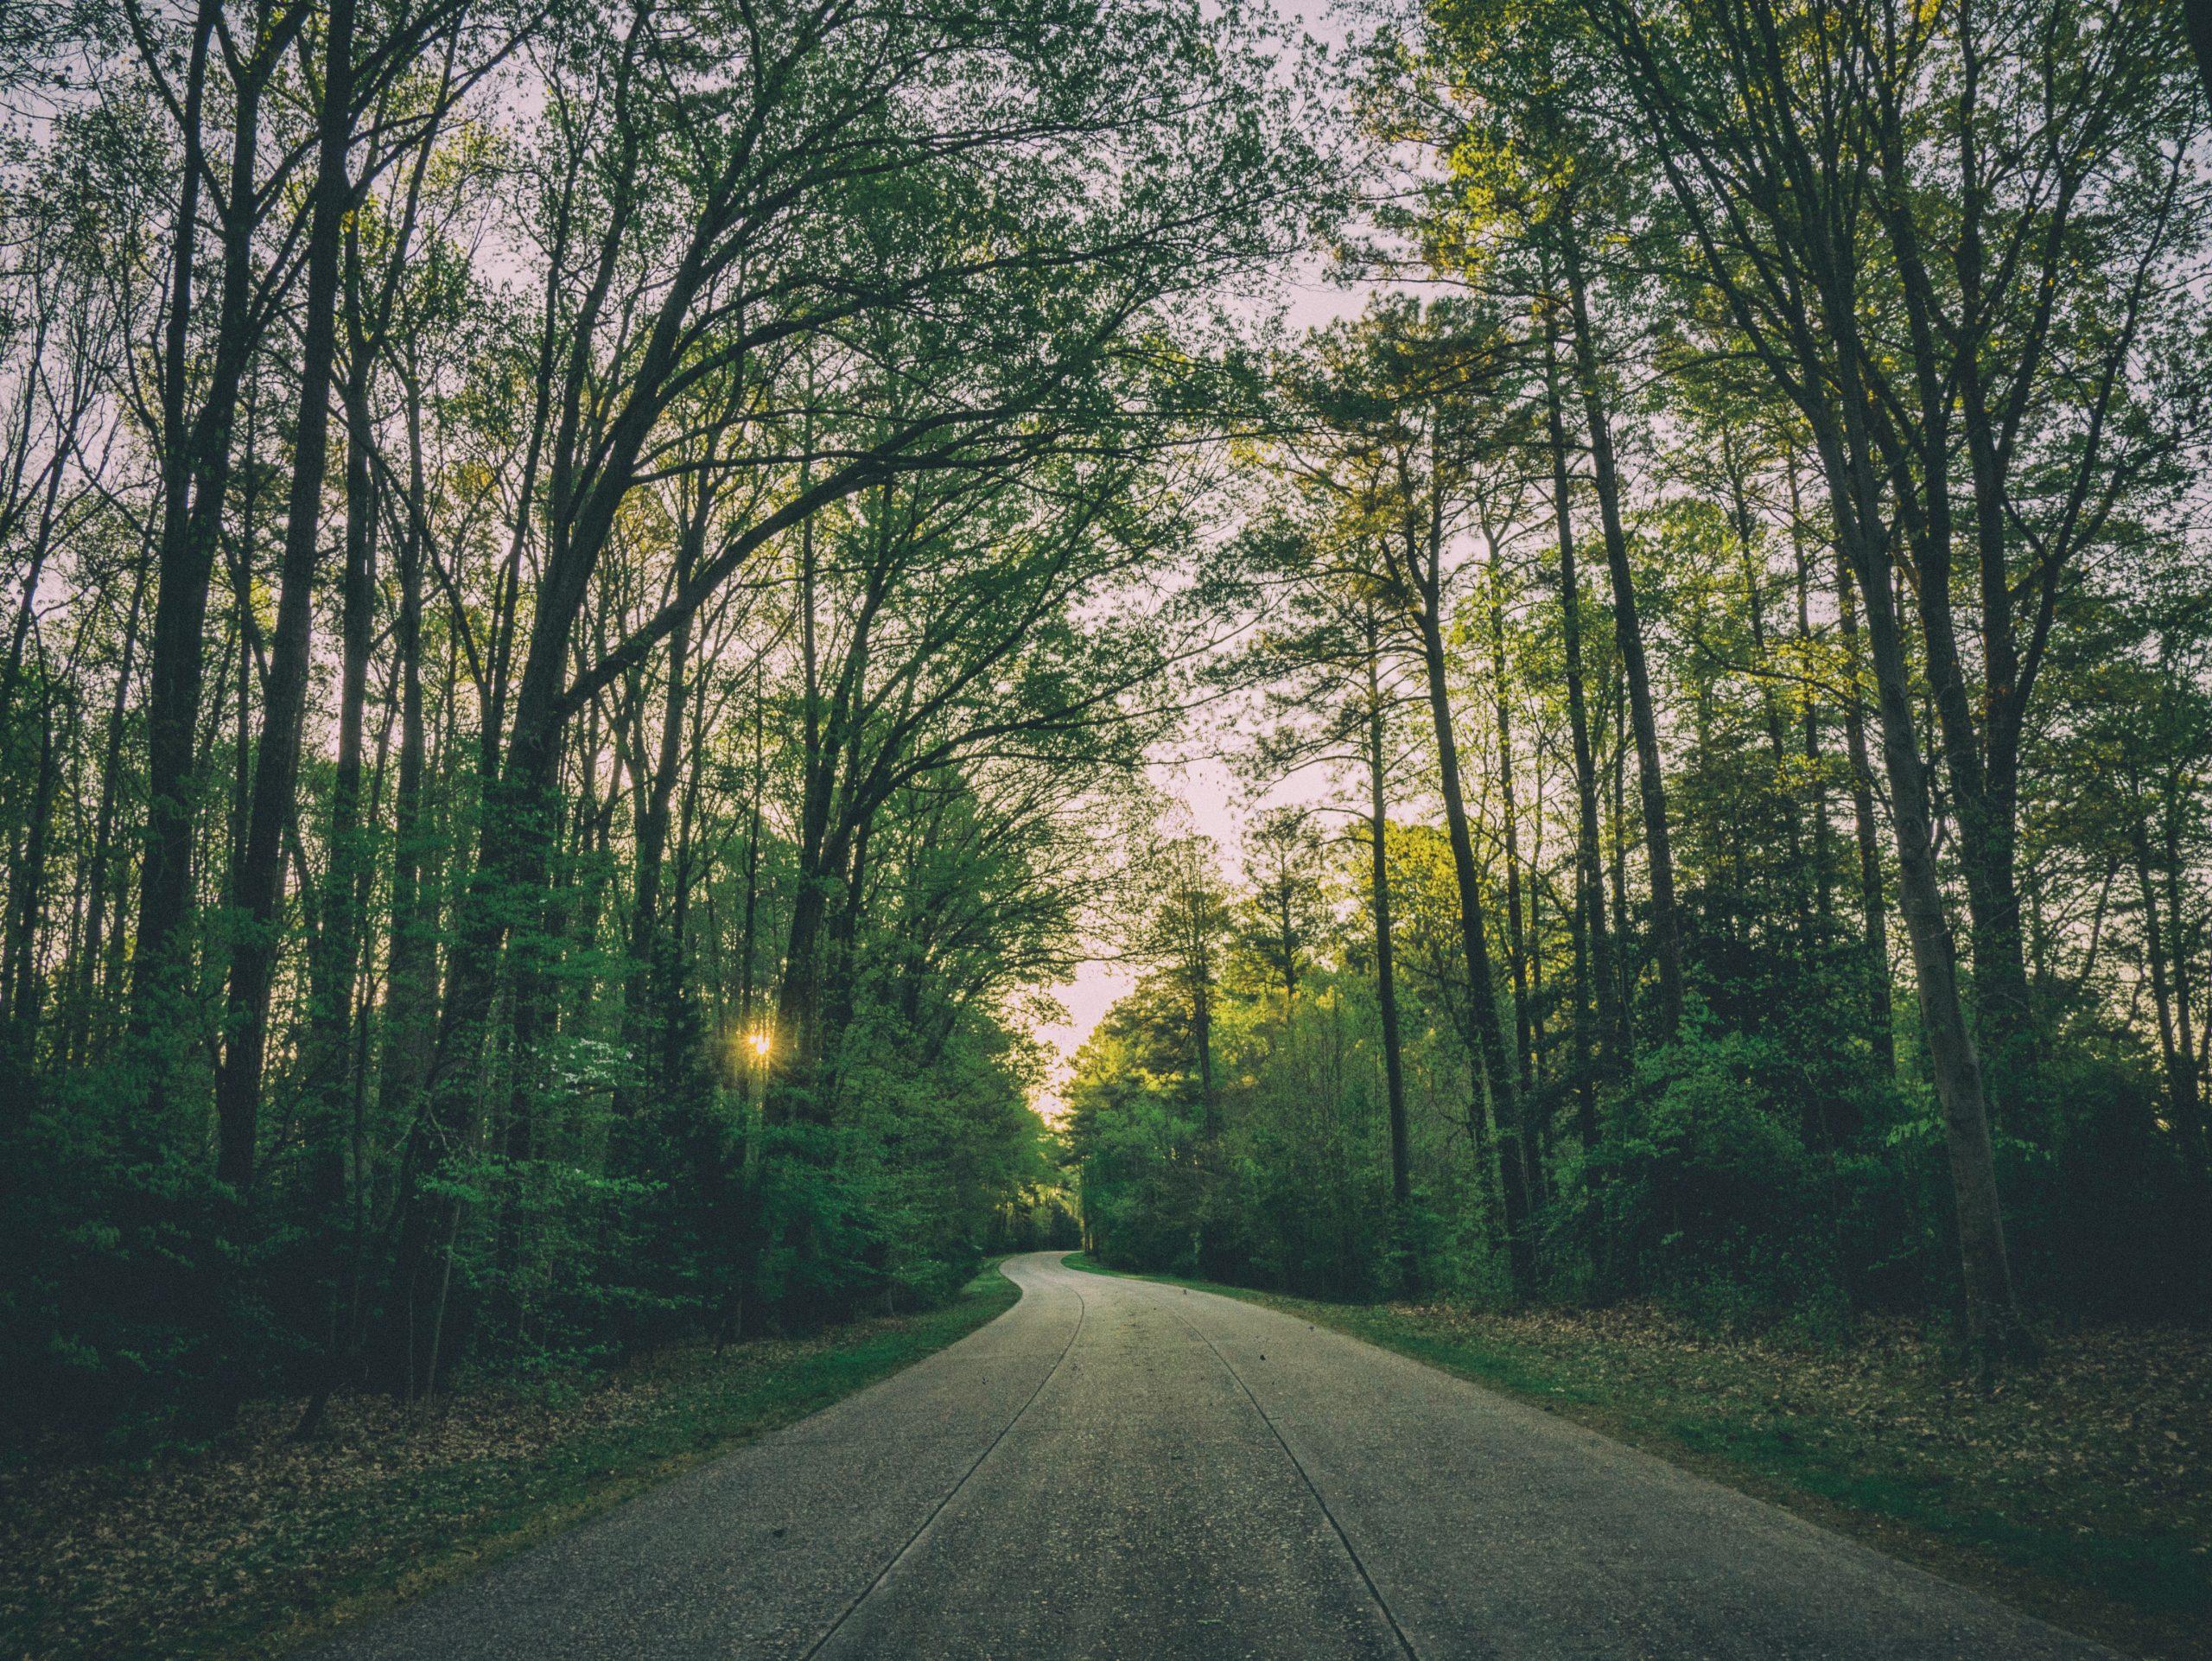 williamsburg virginia road through the canopy of trees